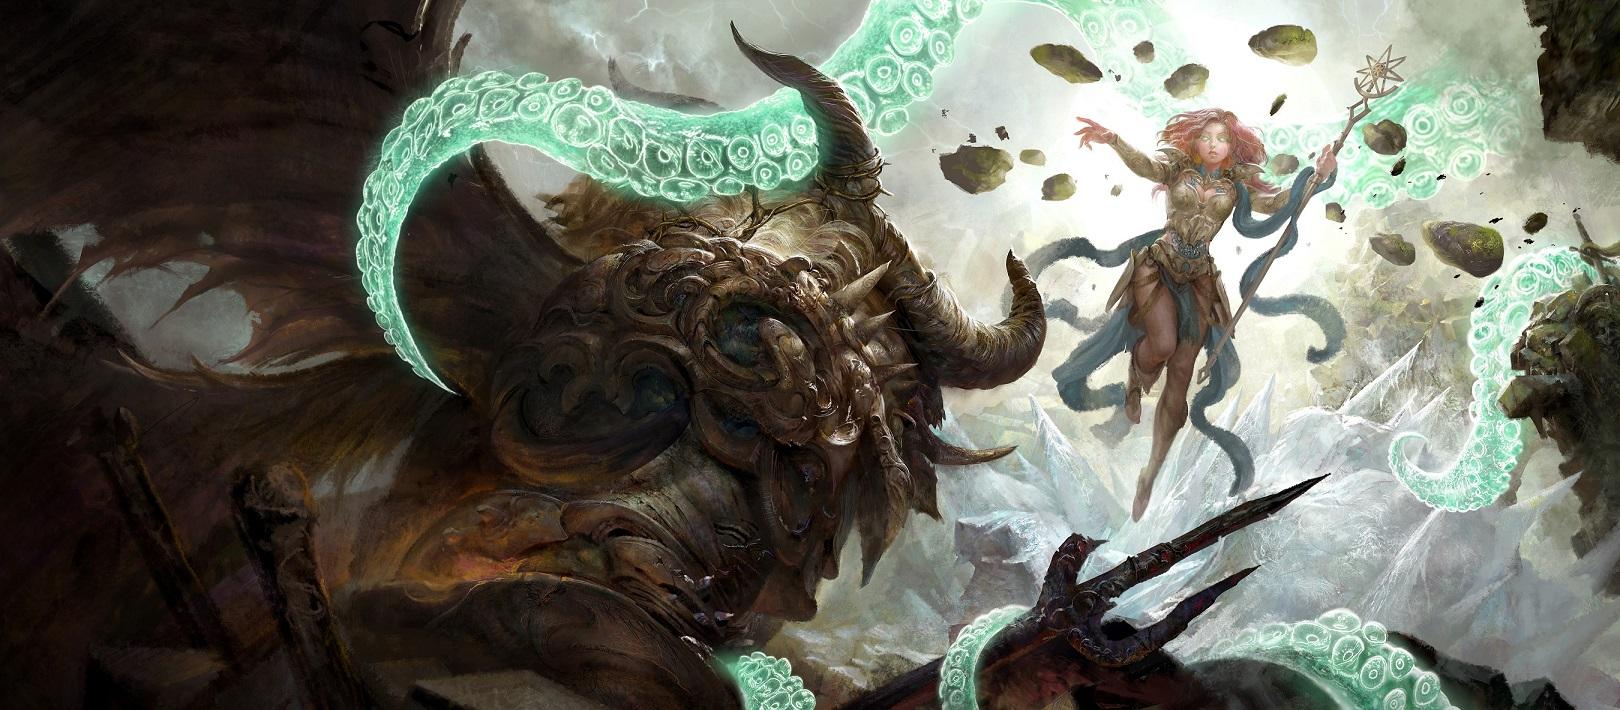 Game Art: Divinity II Fanart